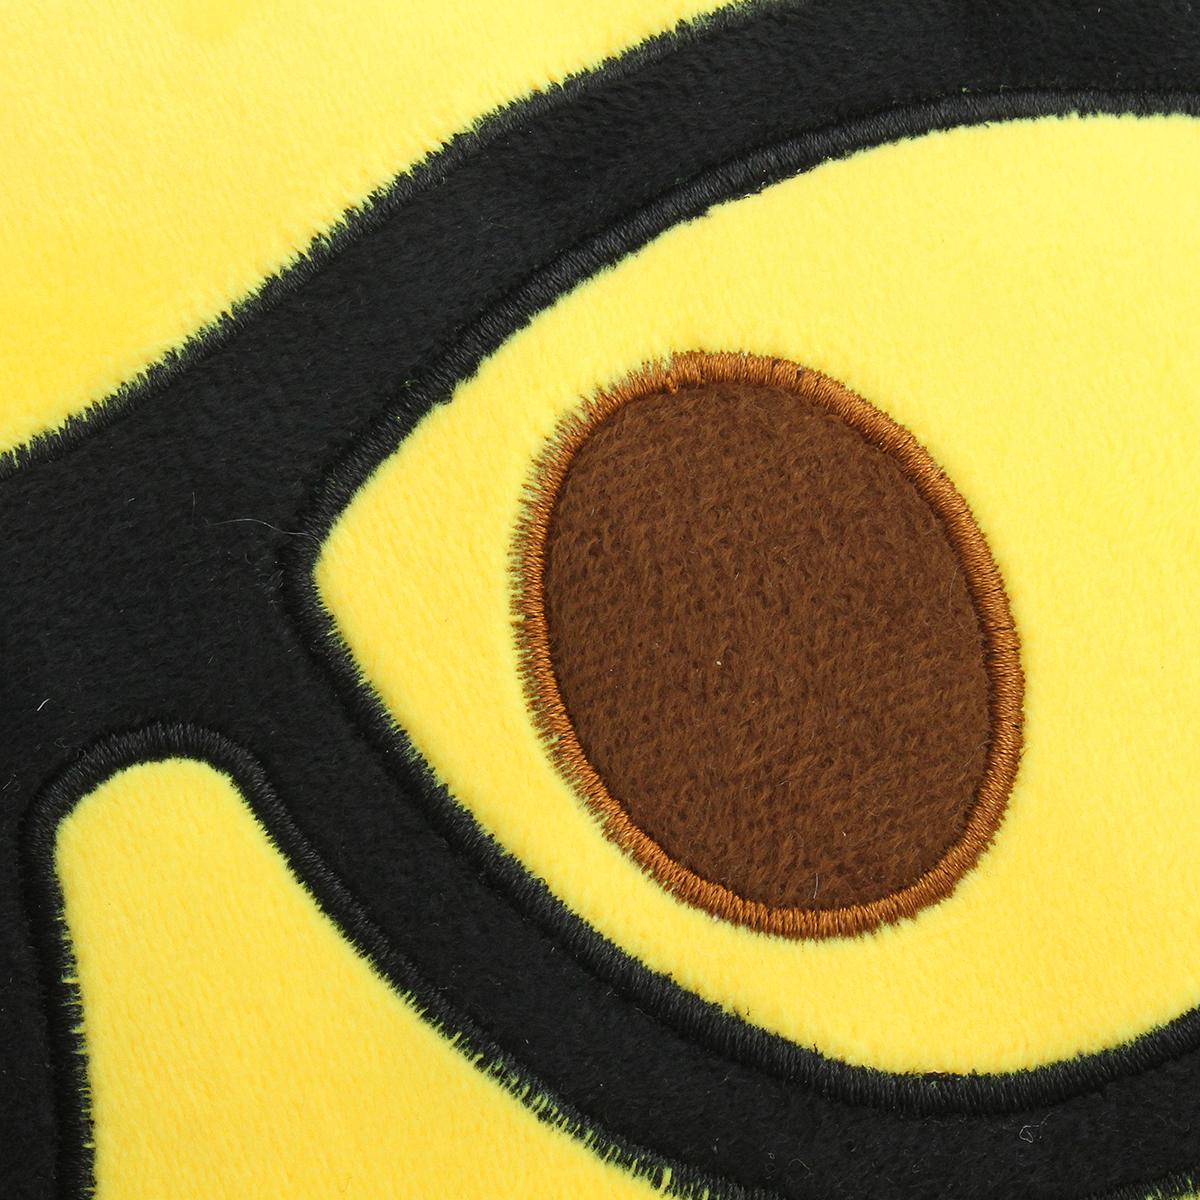 35CM Large Front Teeth Nerd Emoji Emoticon Plush PP Cotton Soft Toy - Photo: 4